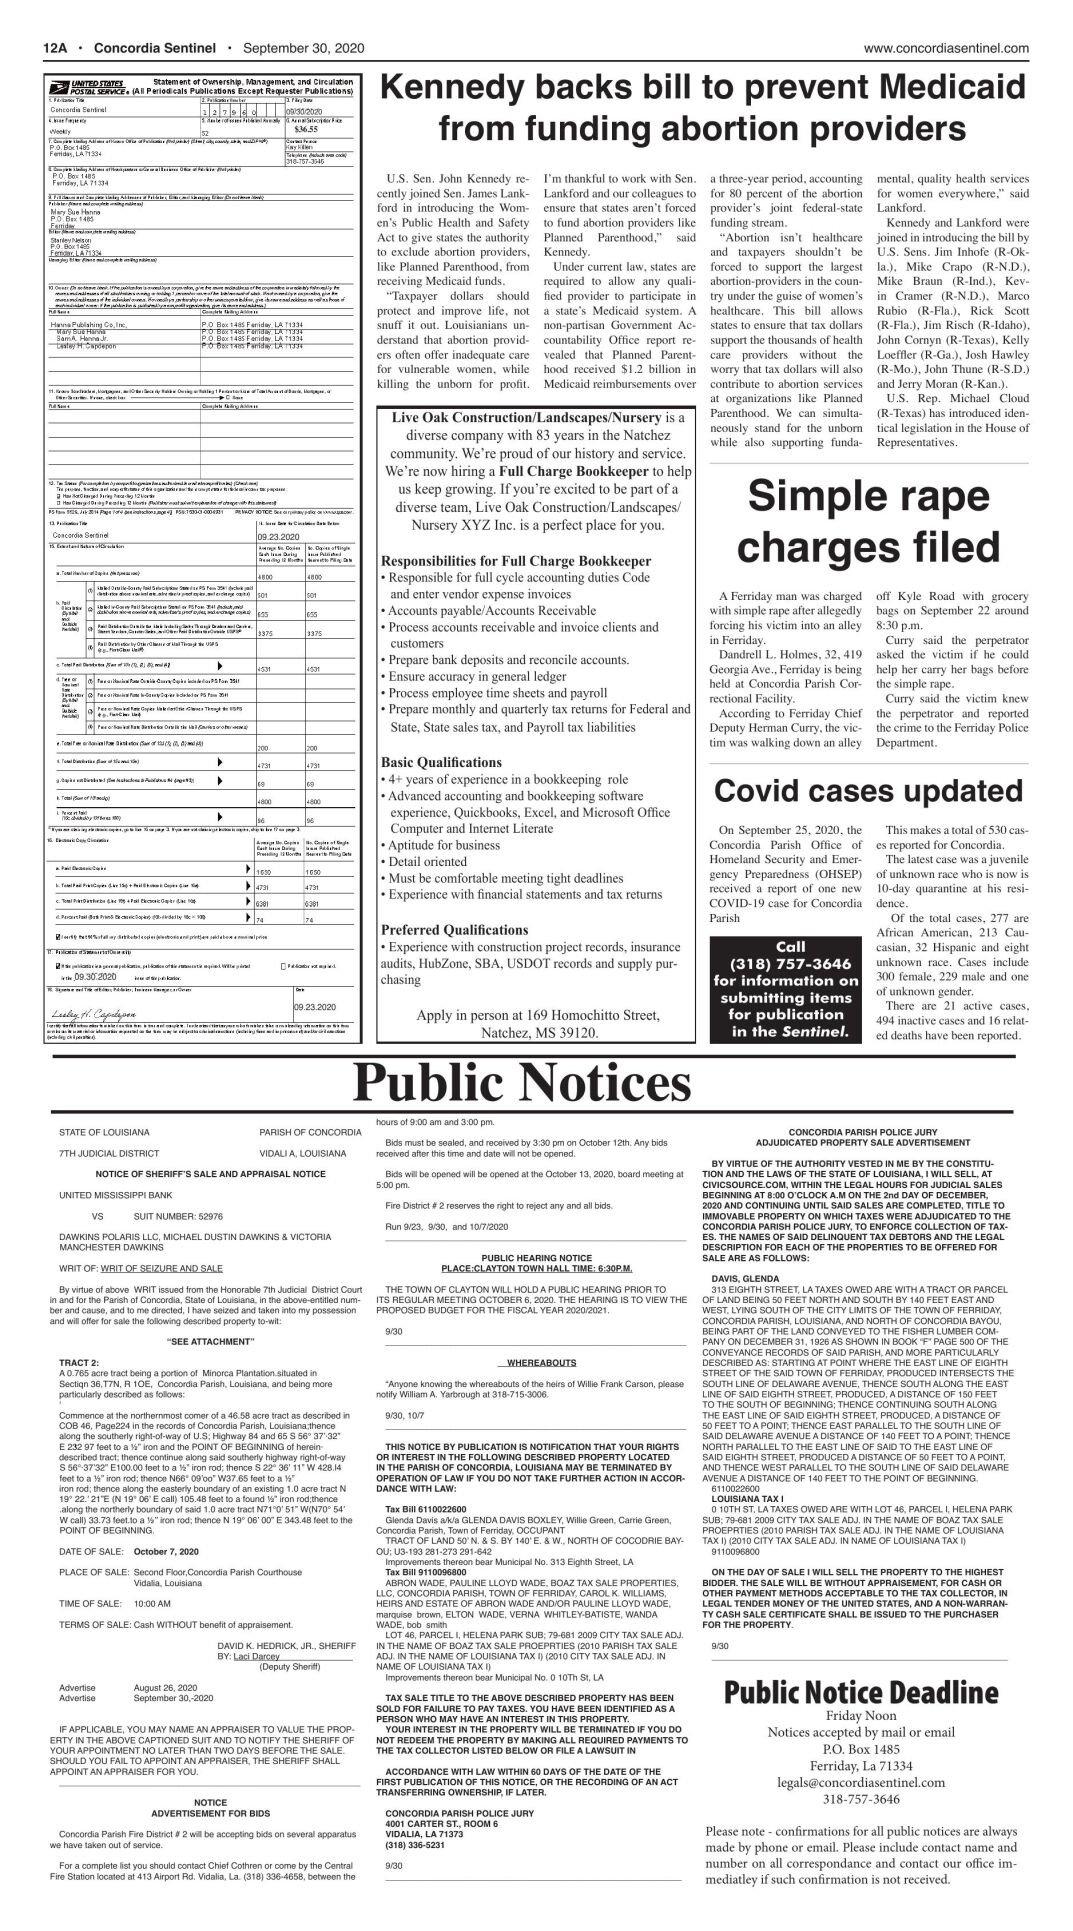 Public Notices - Sept. 30, 2020